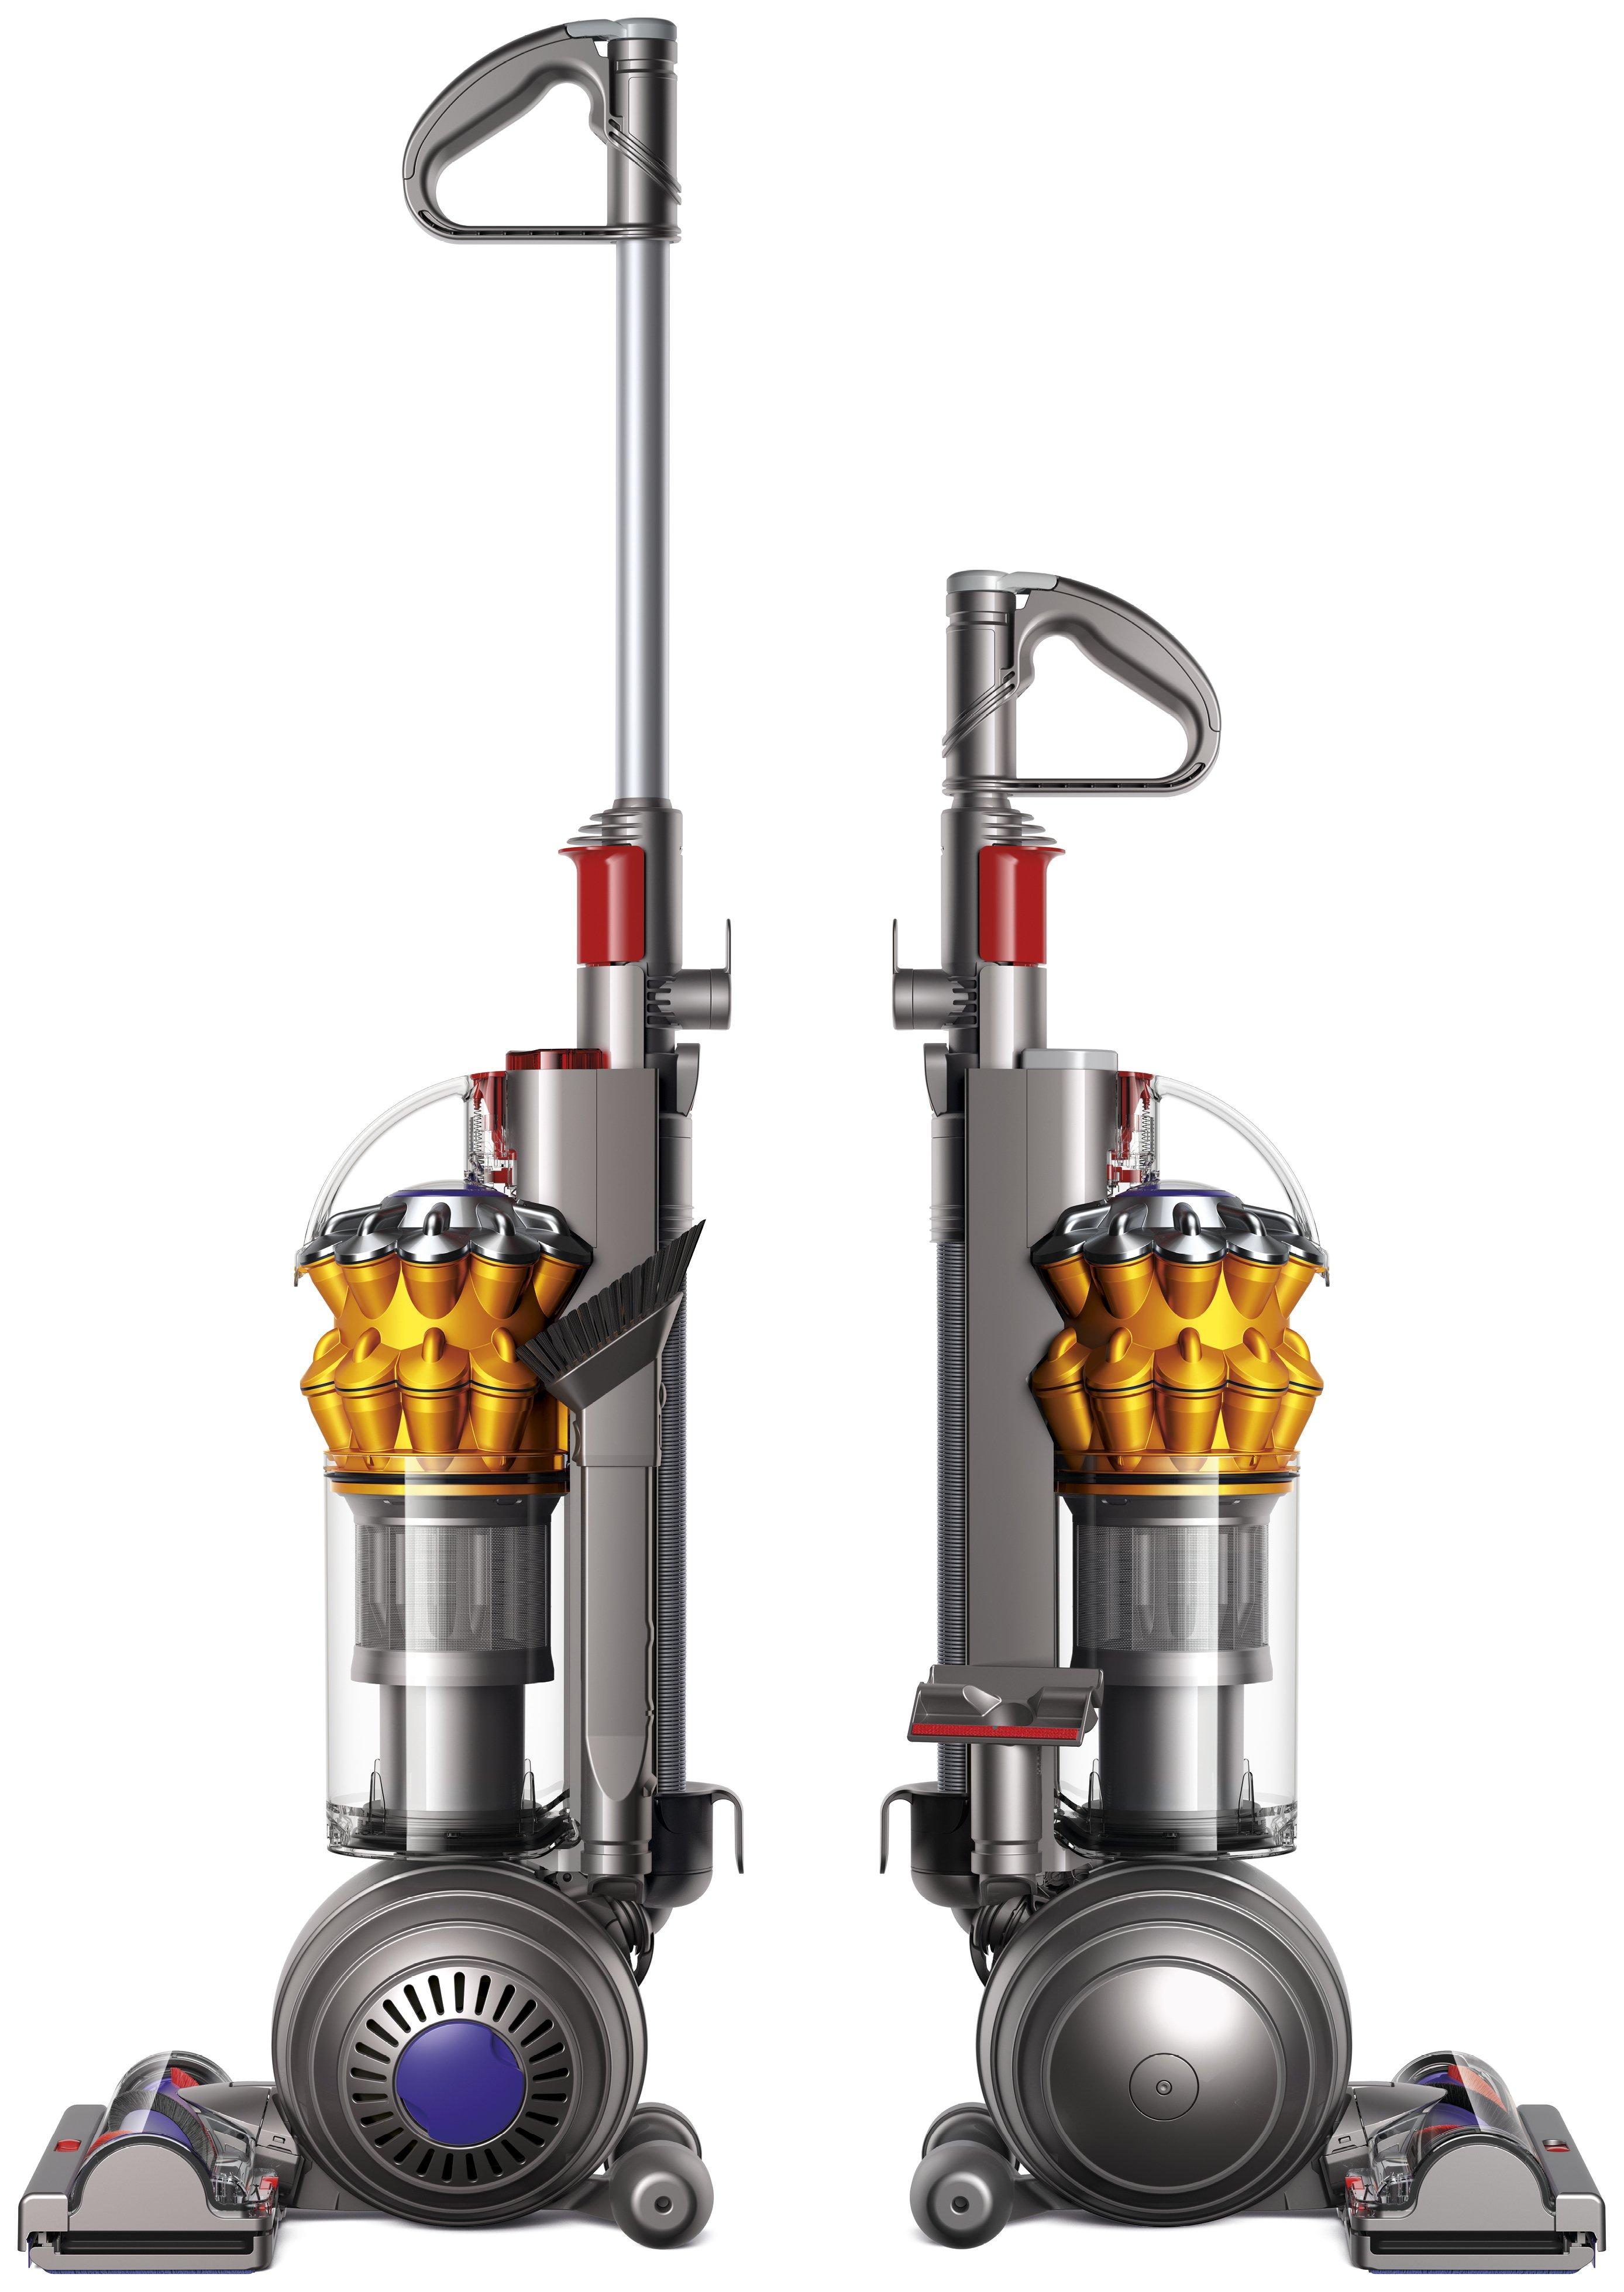 Dyson up15 small ball multifloor купить dyson v6 handheld trigger